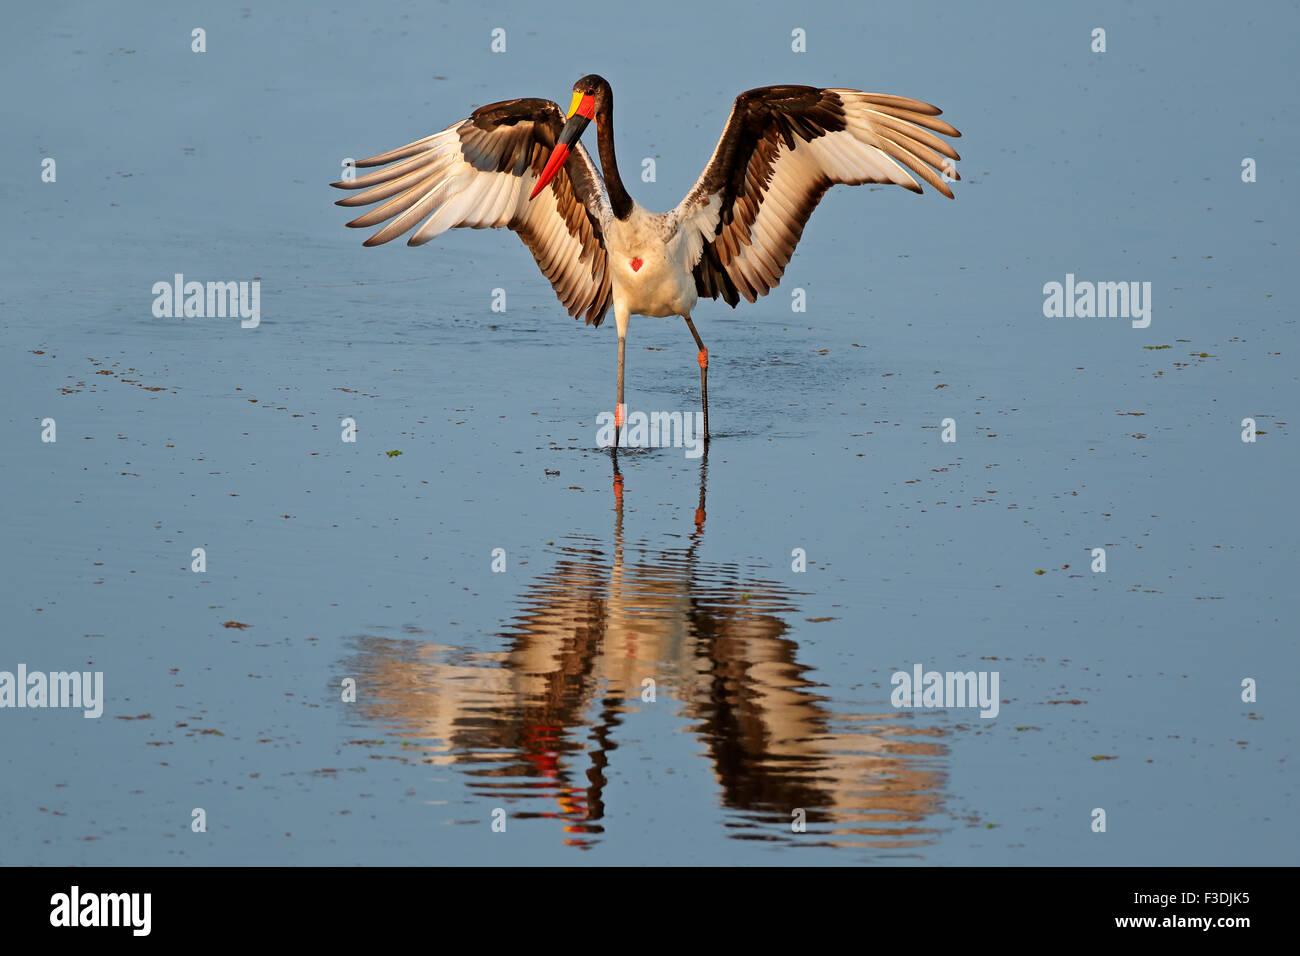 Sella da cavallo-fatturati stork (Ephippiorhynchus senegalensis), Kruger National Park, Sud Africa Immagini Stock